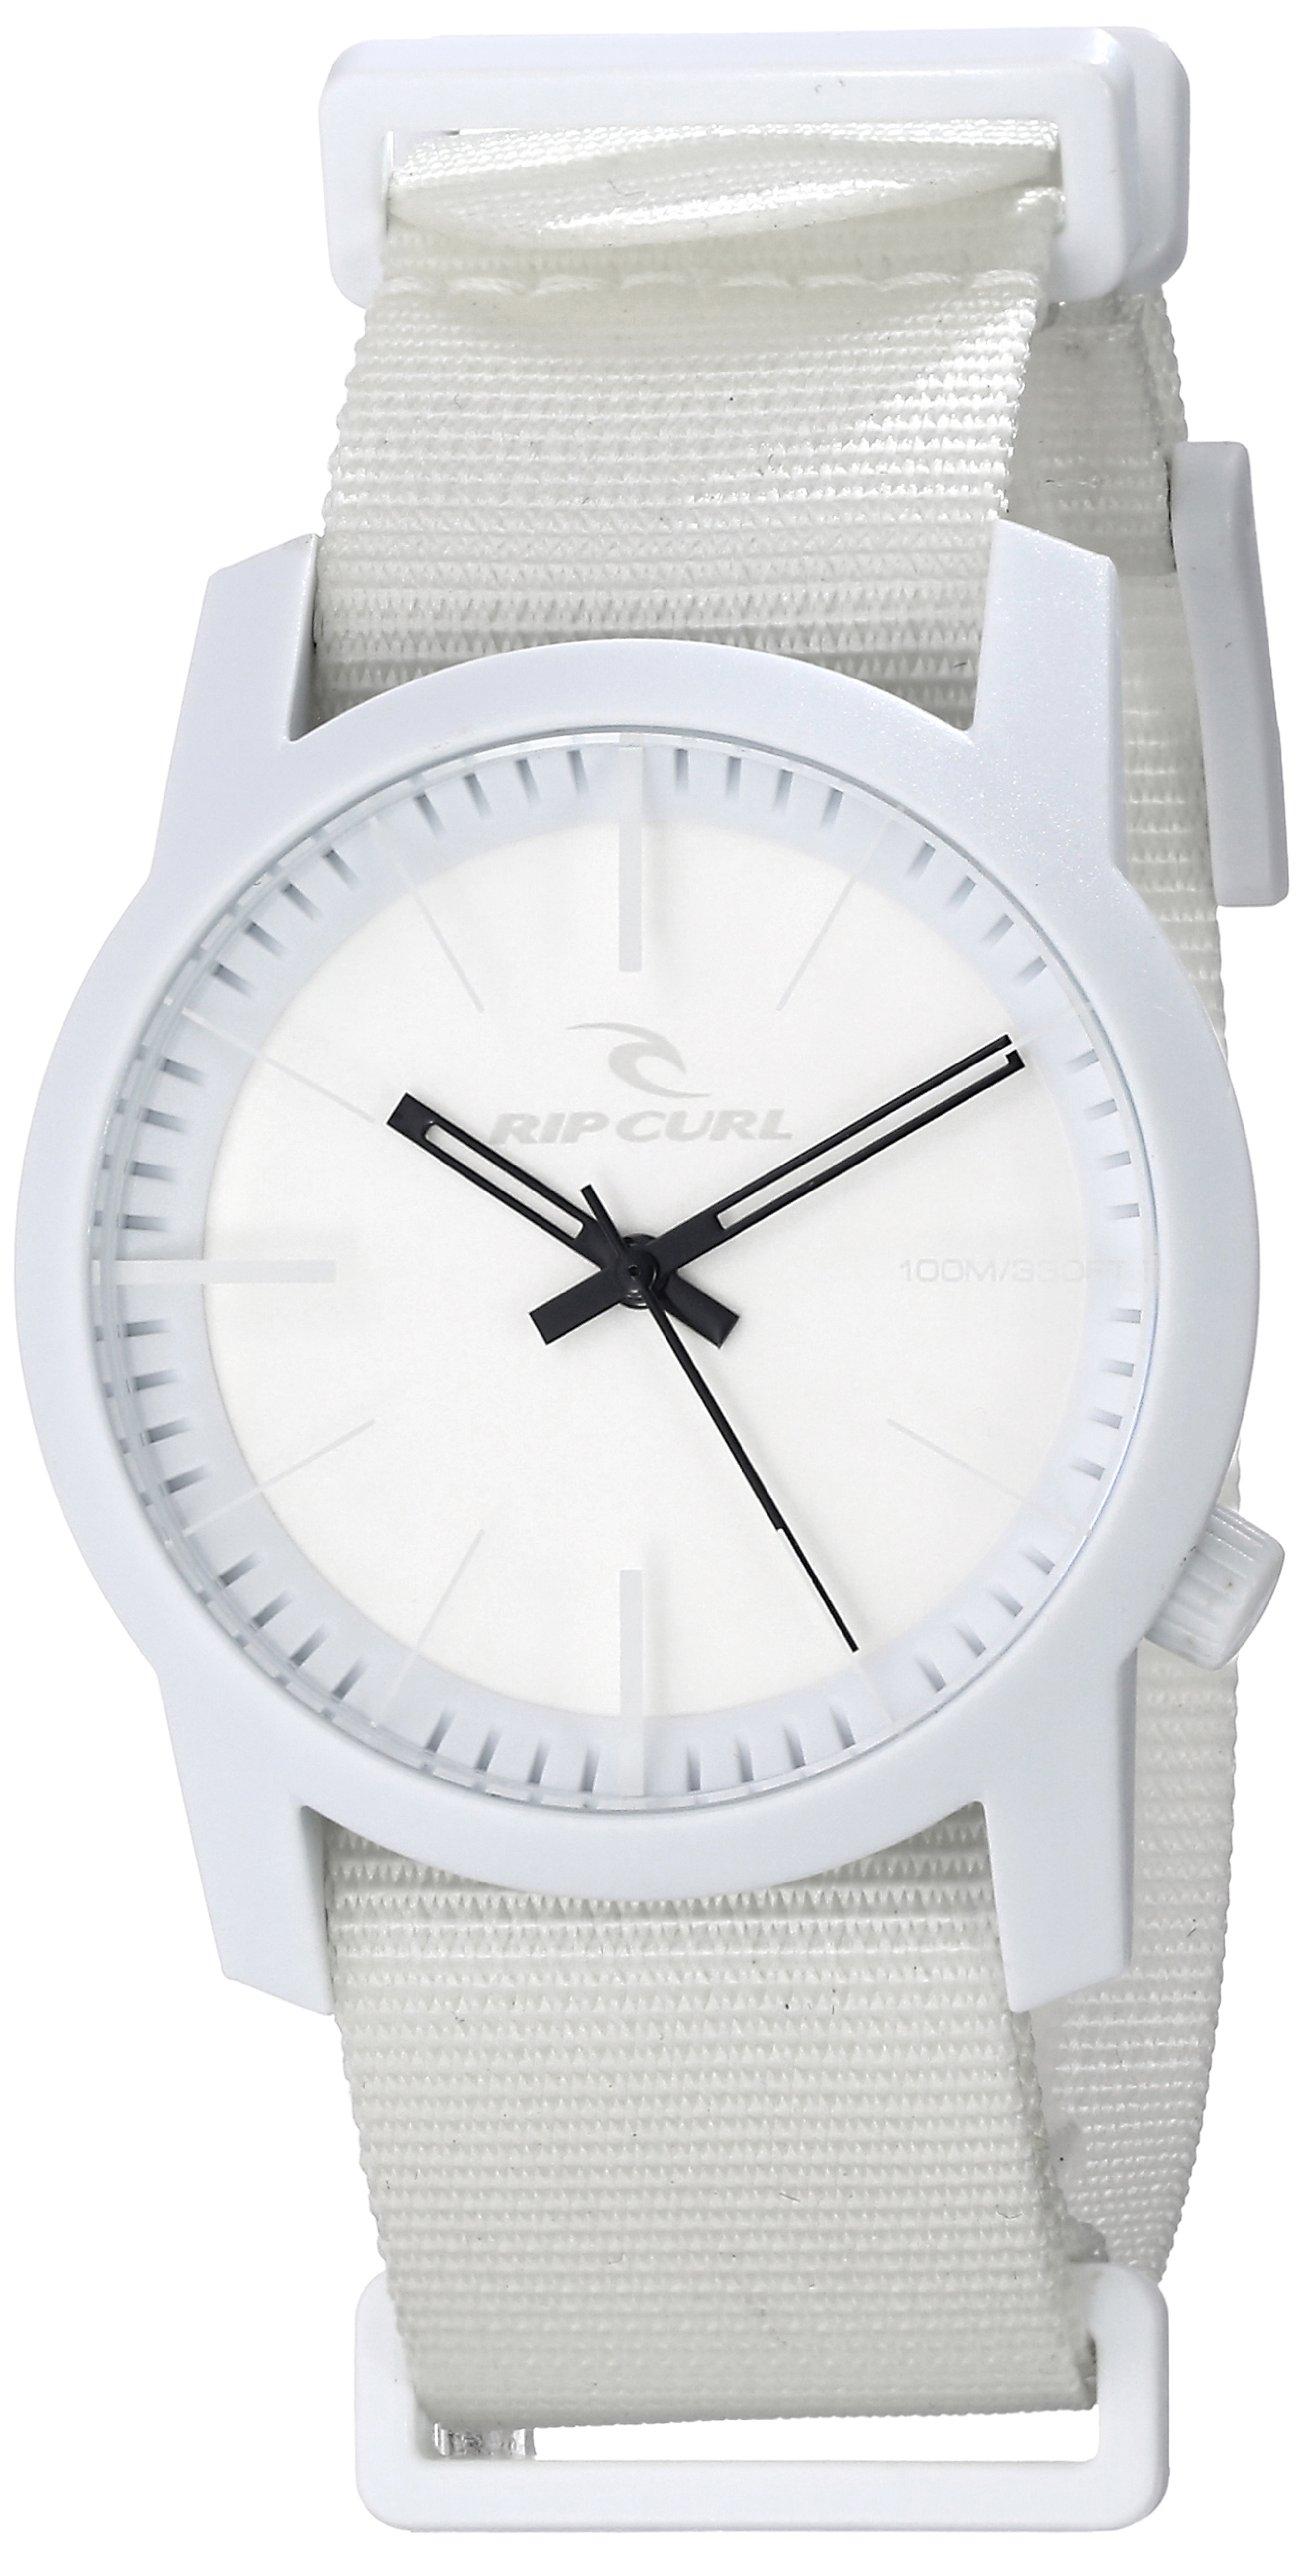 Rip Curl Men's A2569 - WHI Cambridge ABS White Classic Analog Fashion Watch